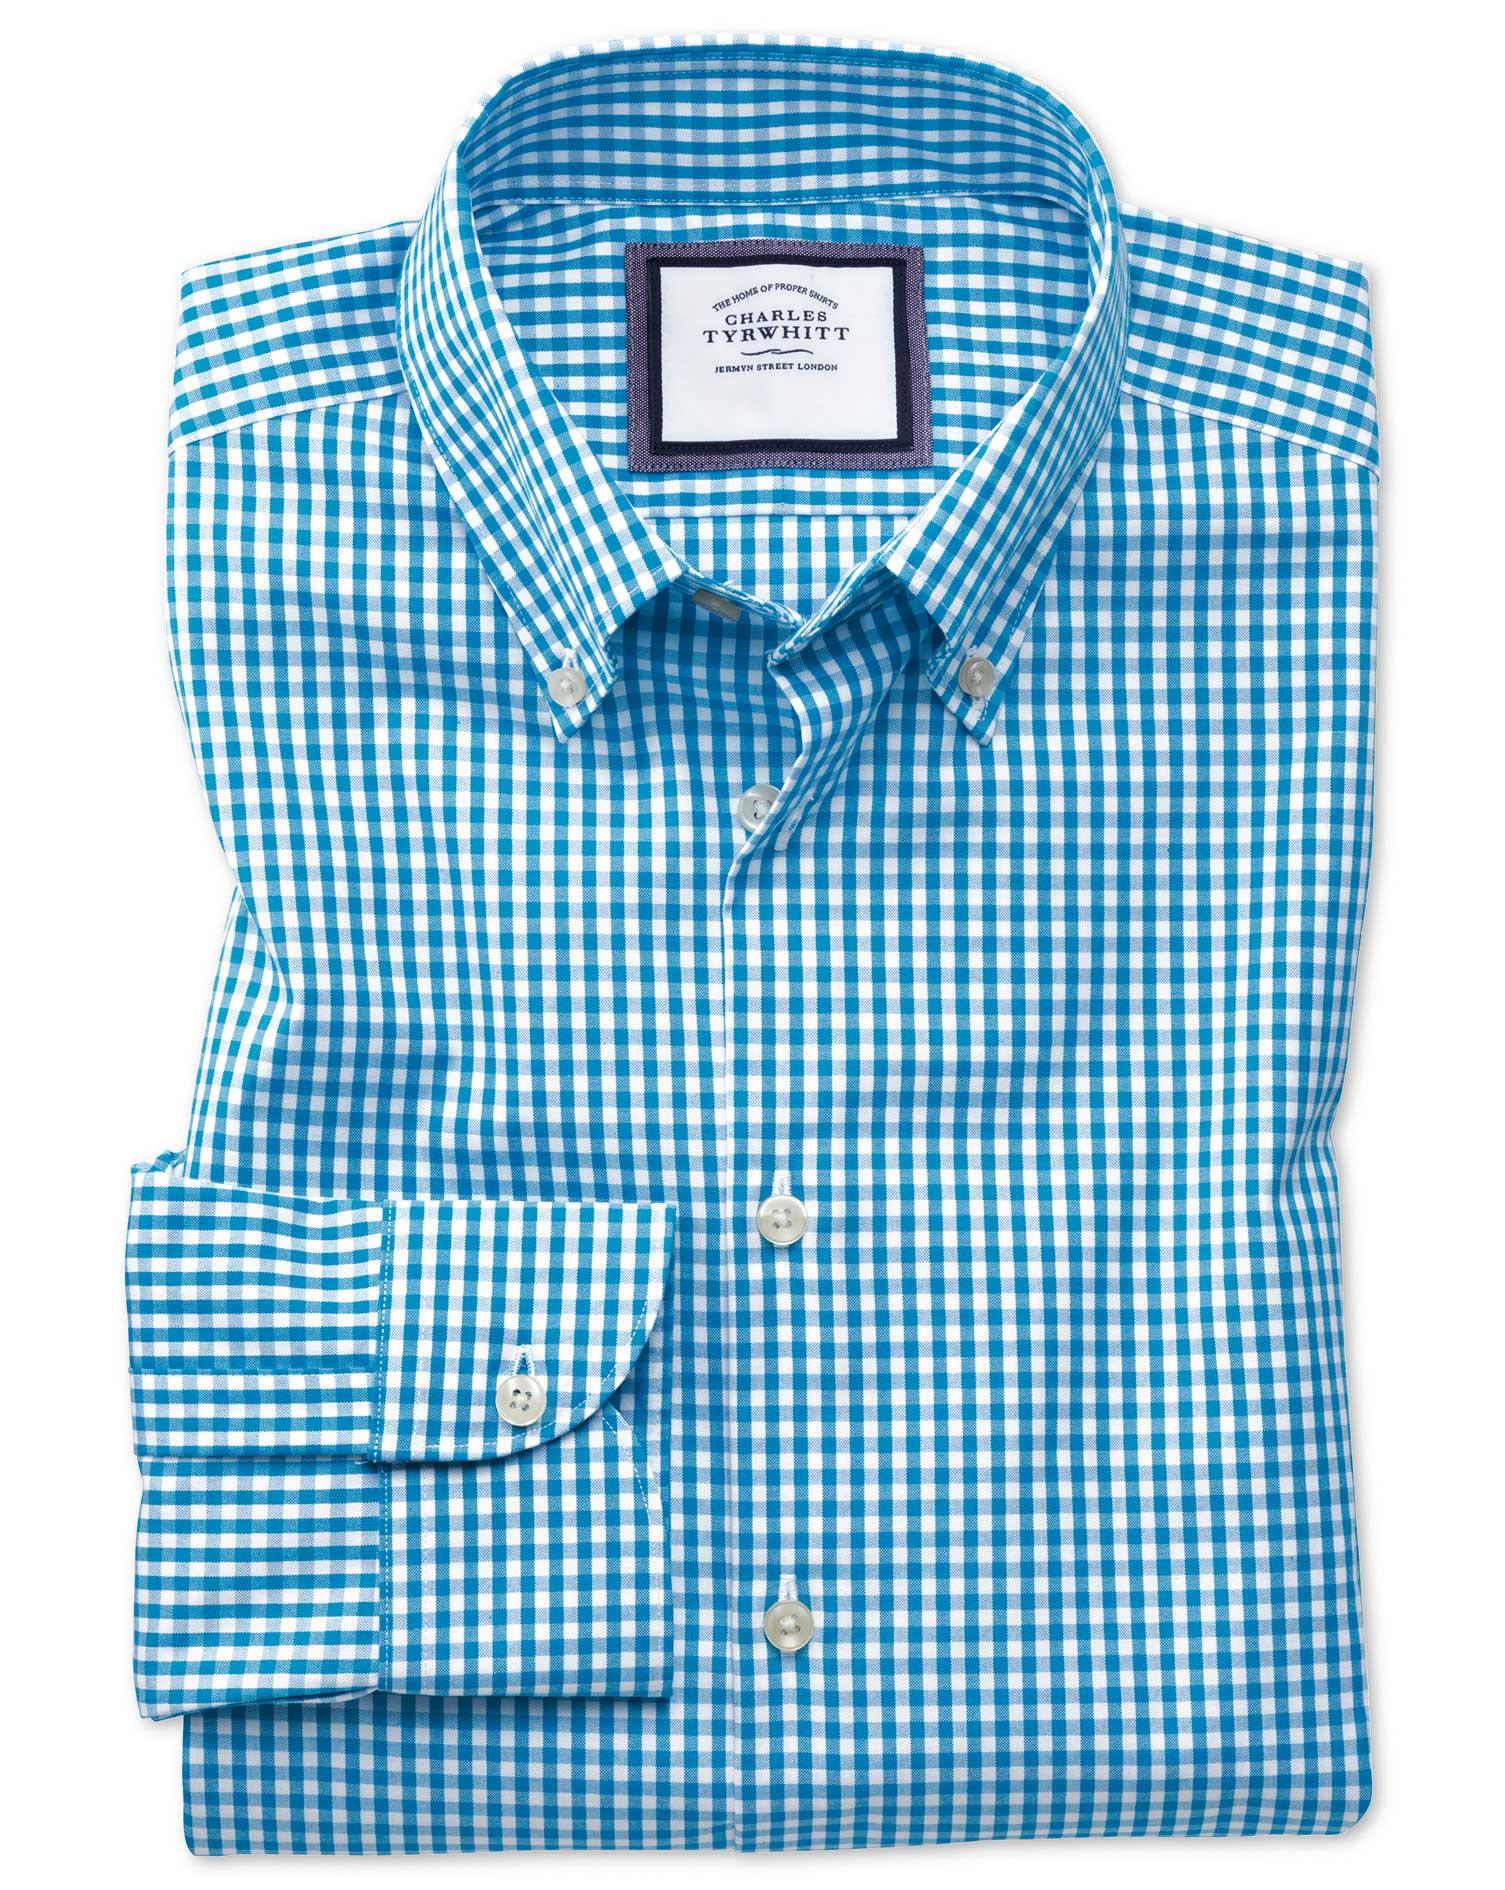 Classic Fit Button-Down Business Casual Non-Iron Aqua Blue Cotton Formal Shirt Single Cuff Size 16/3